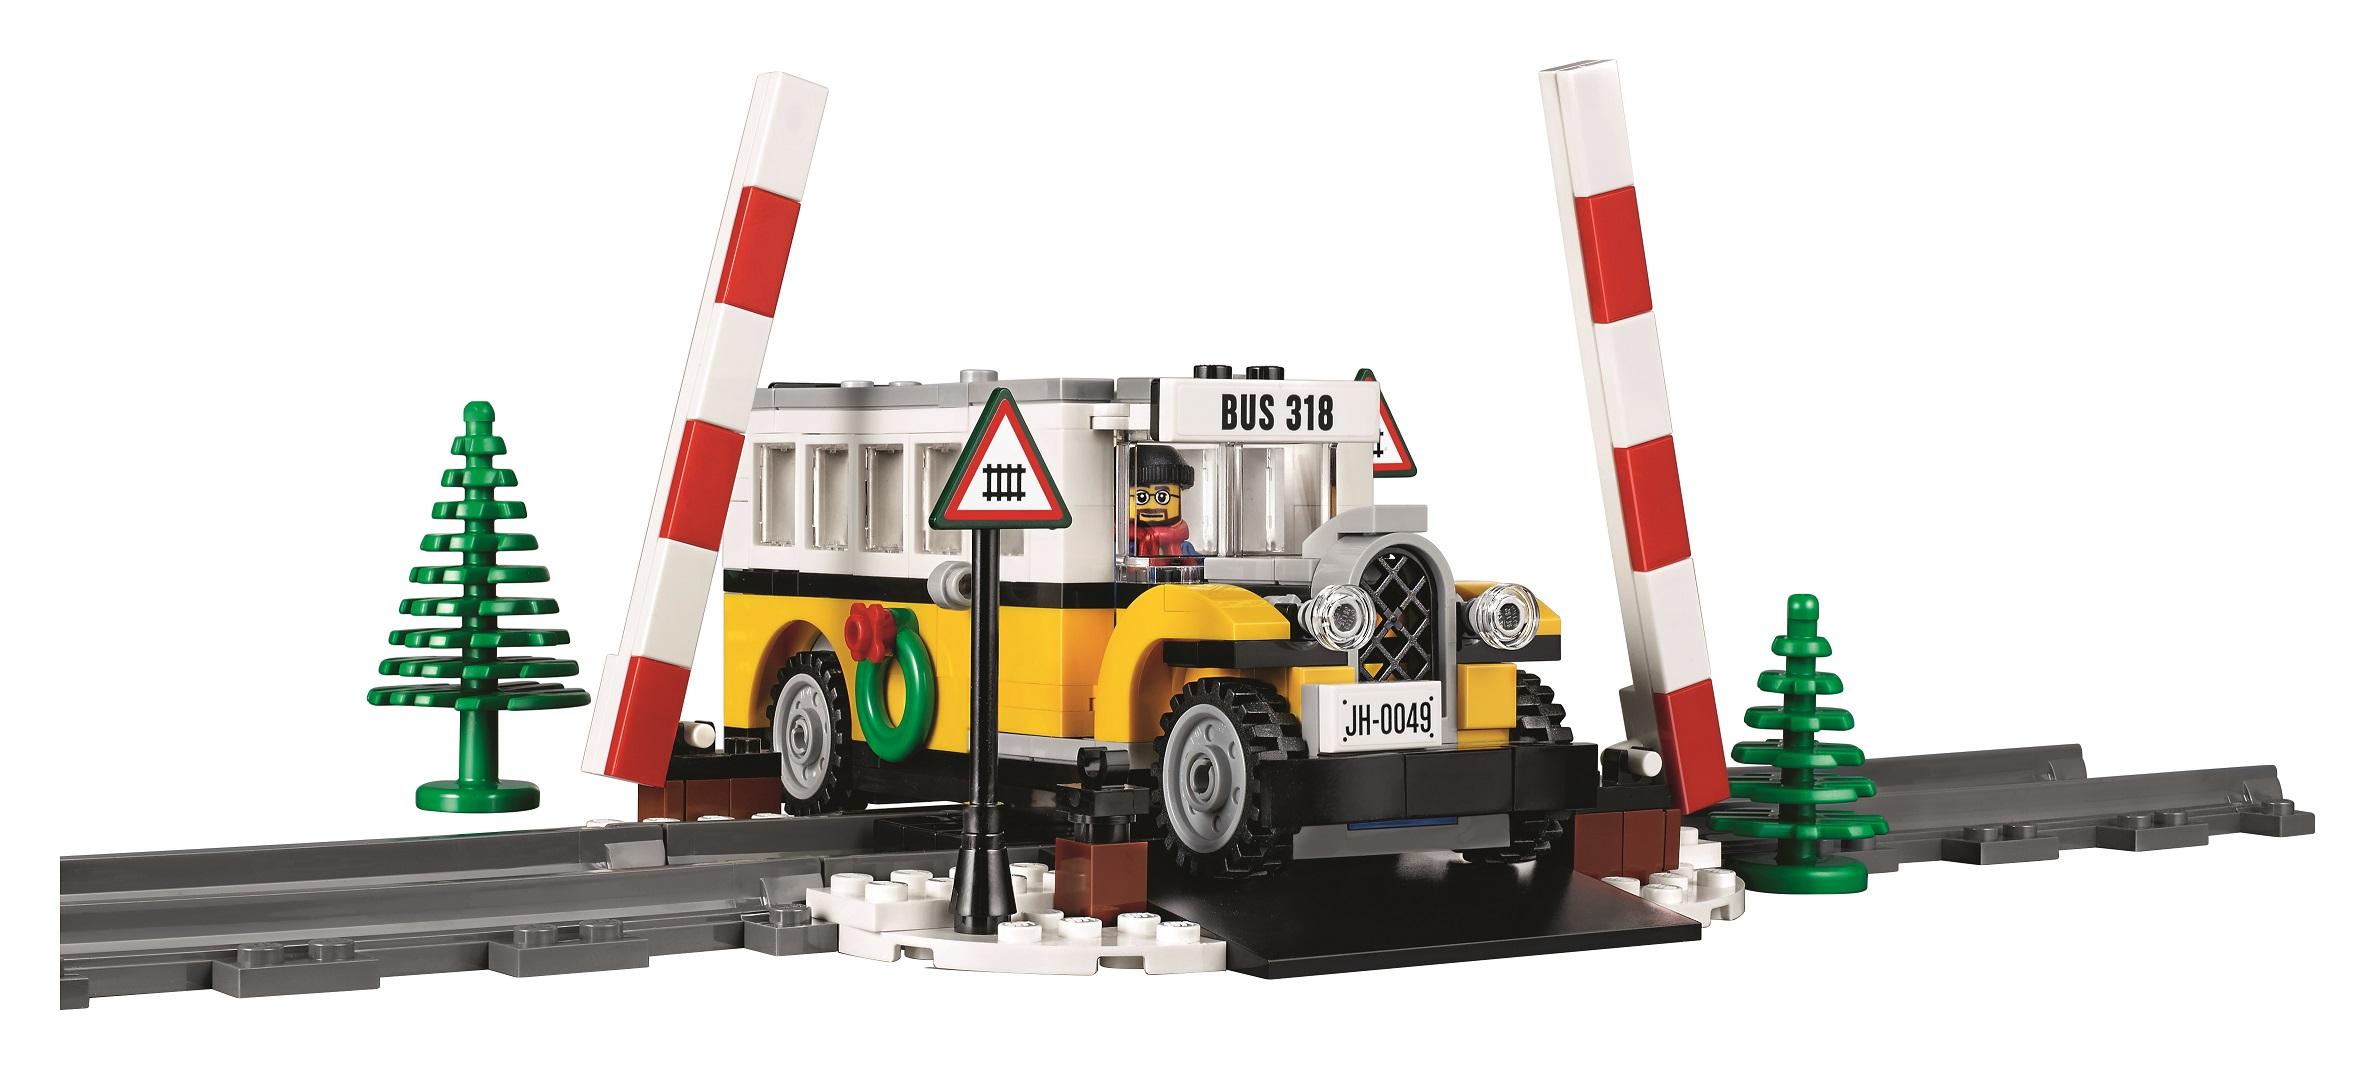 Introducing the 2017 Winter Village set – LEGO 10259 Winter ...